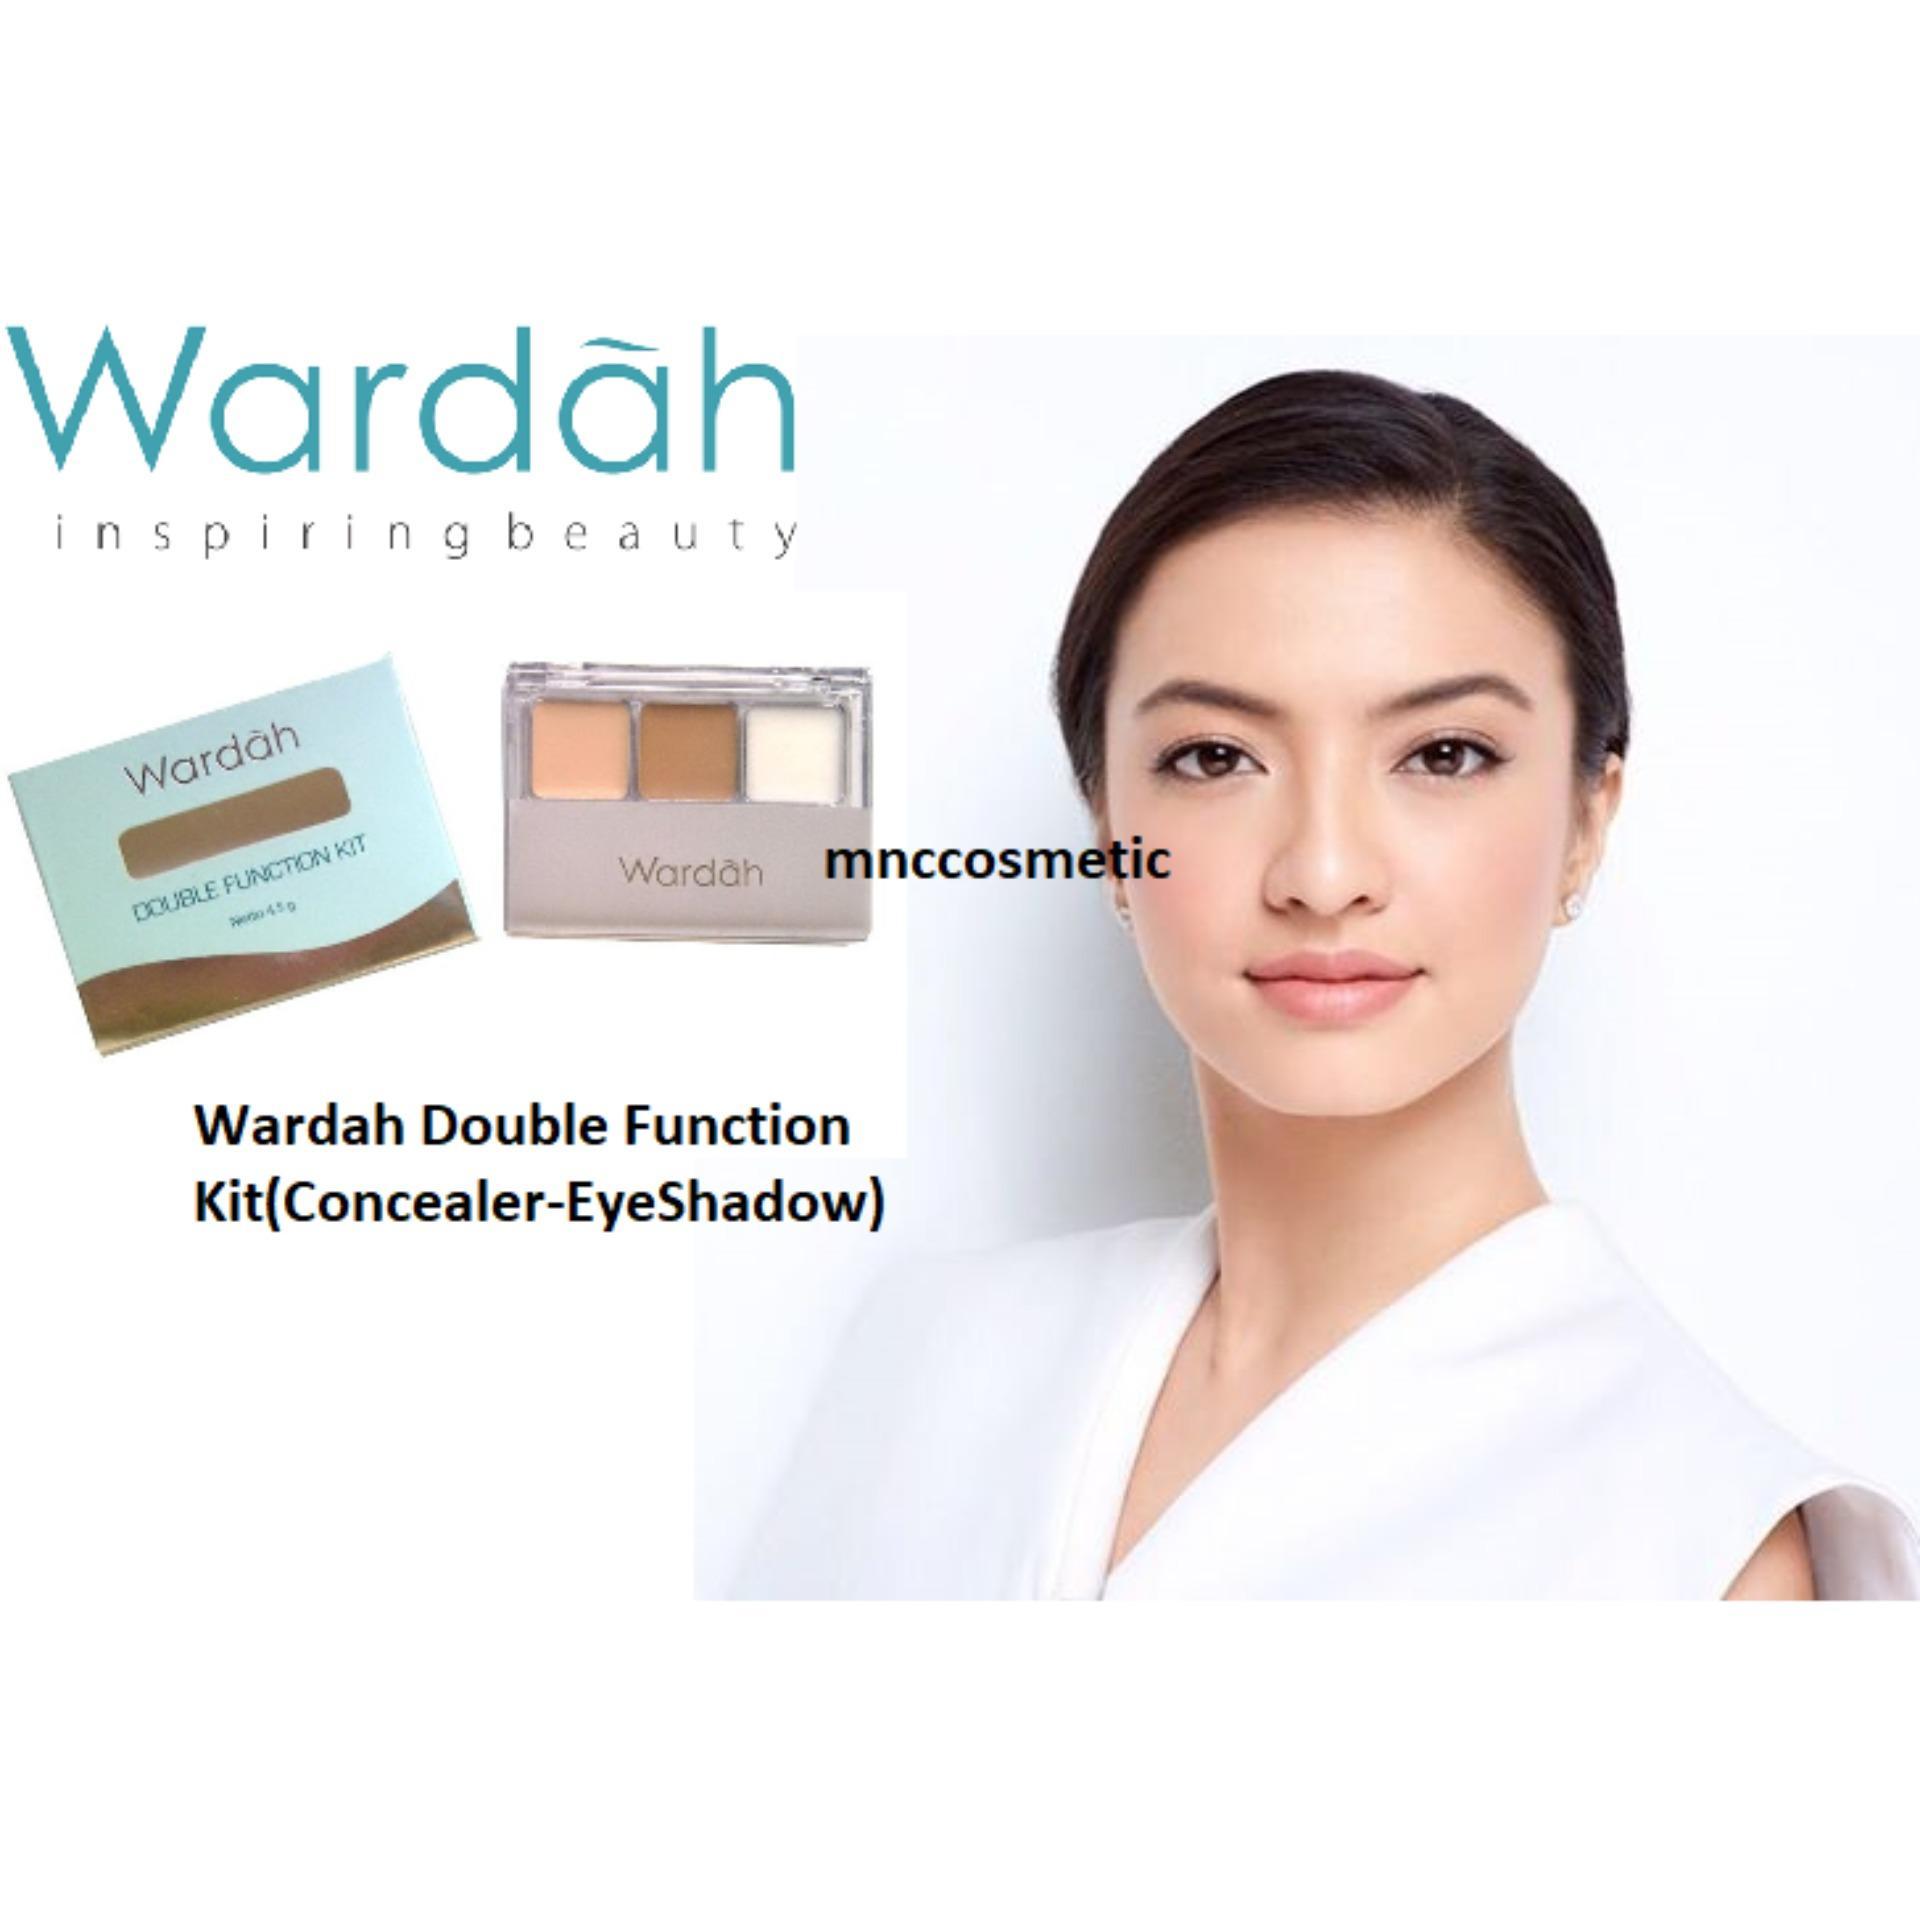 Wardah Double Function Kit (Concealer-EyeShadow)